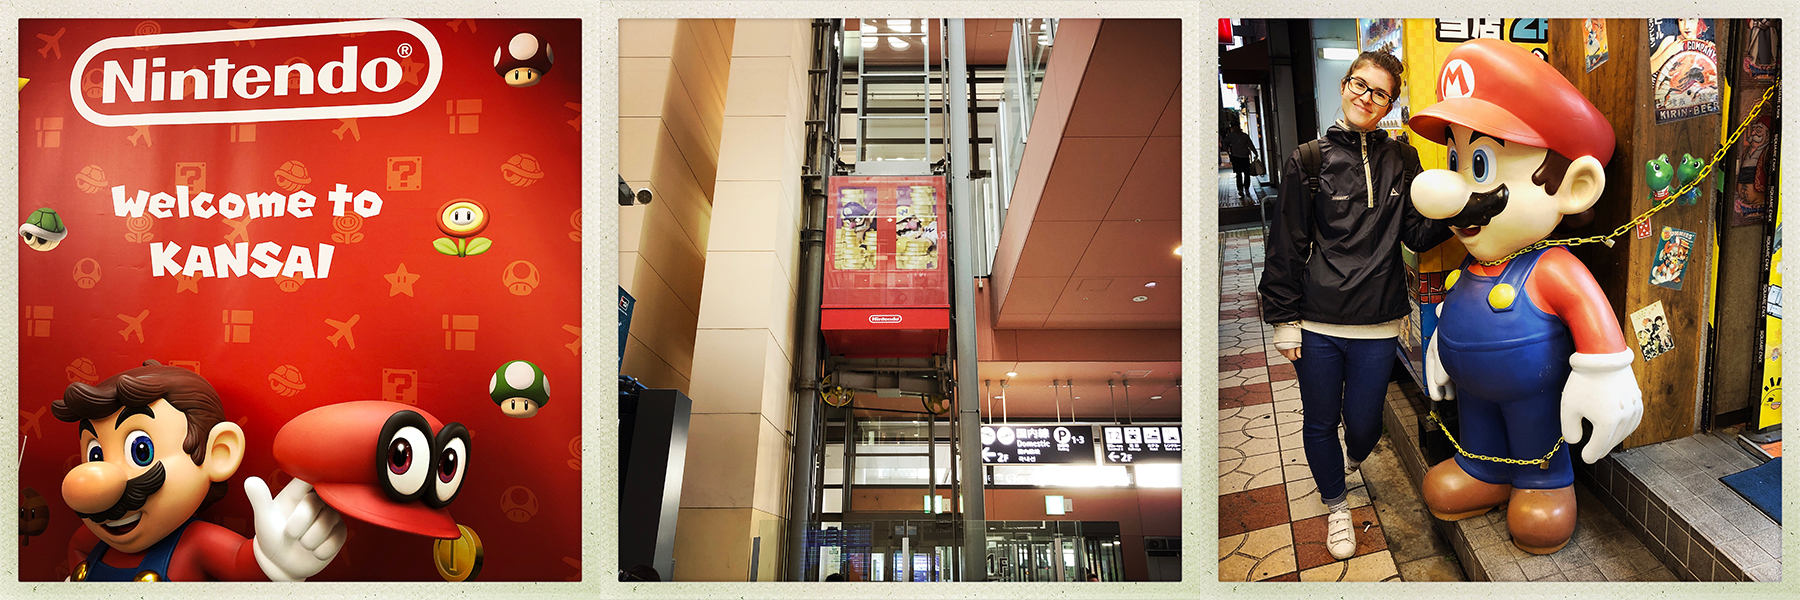 kansai_airport_nintendo_switch_super_mario_odyssey_super_potato.jpg